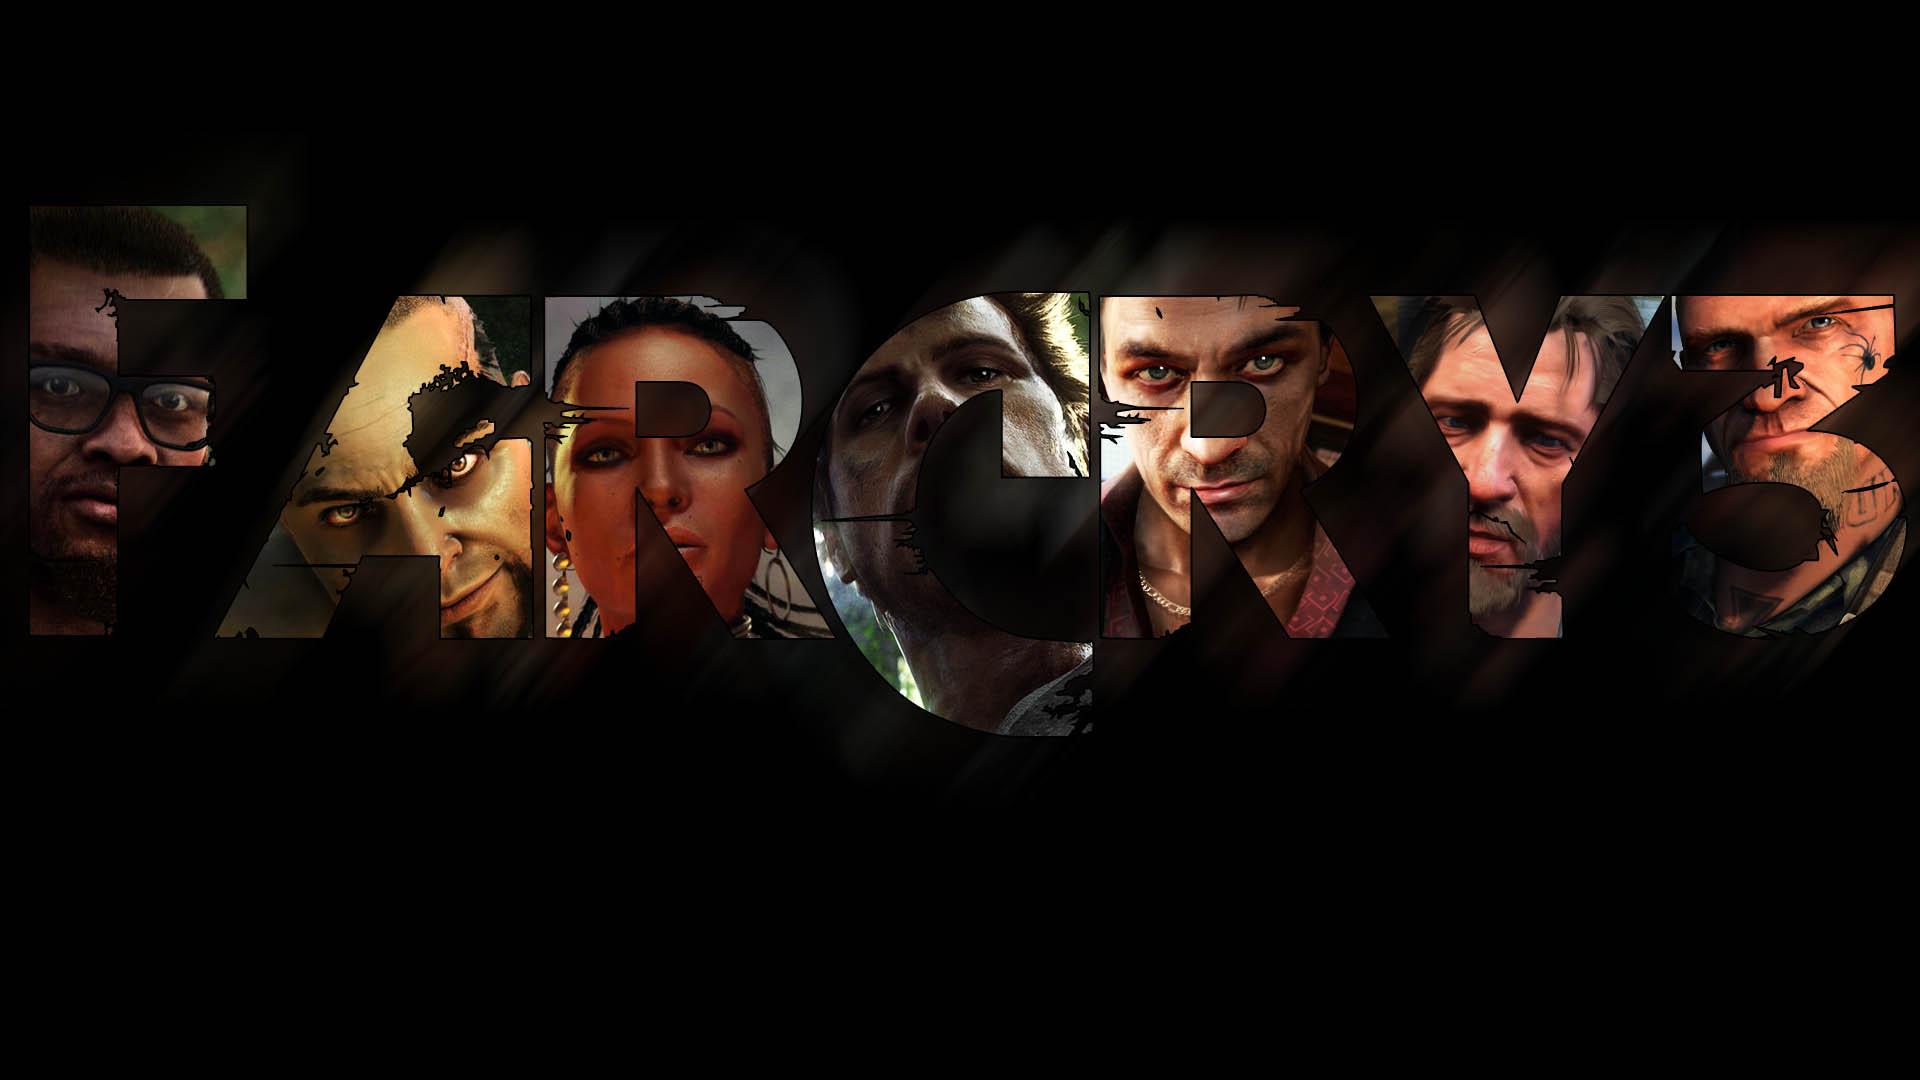 47 Far Cry 3 Hd Wallpapers On Wallpapersafari